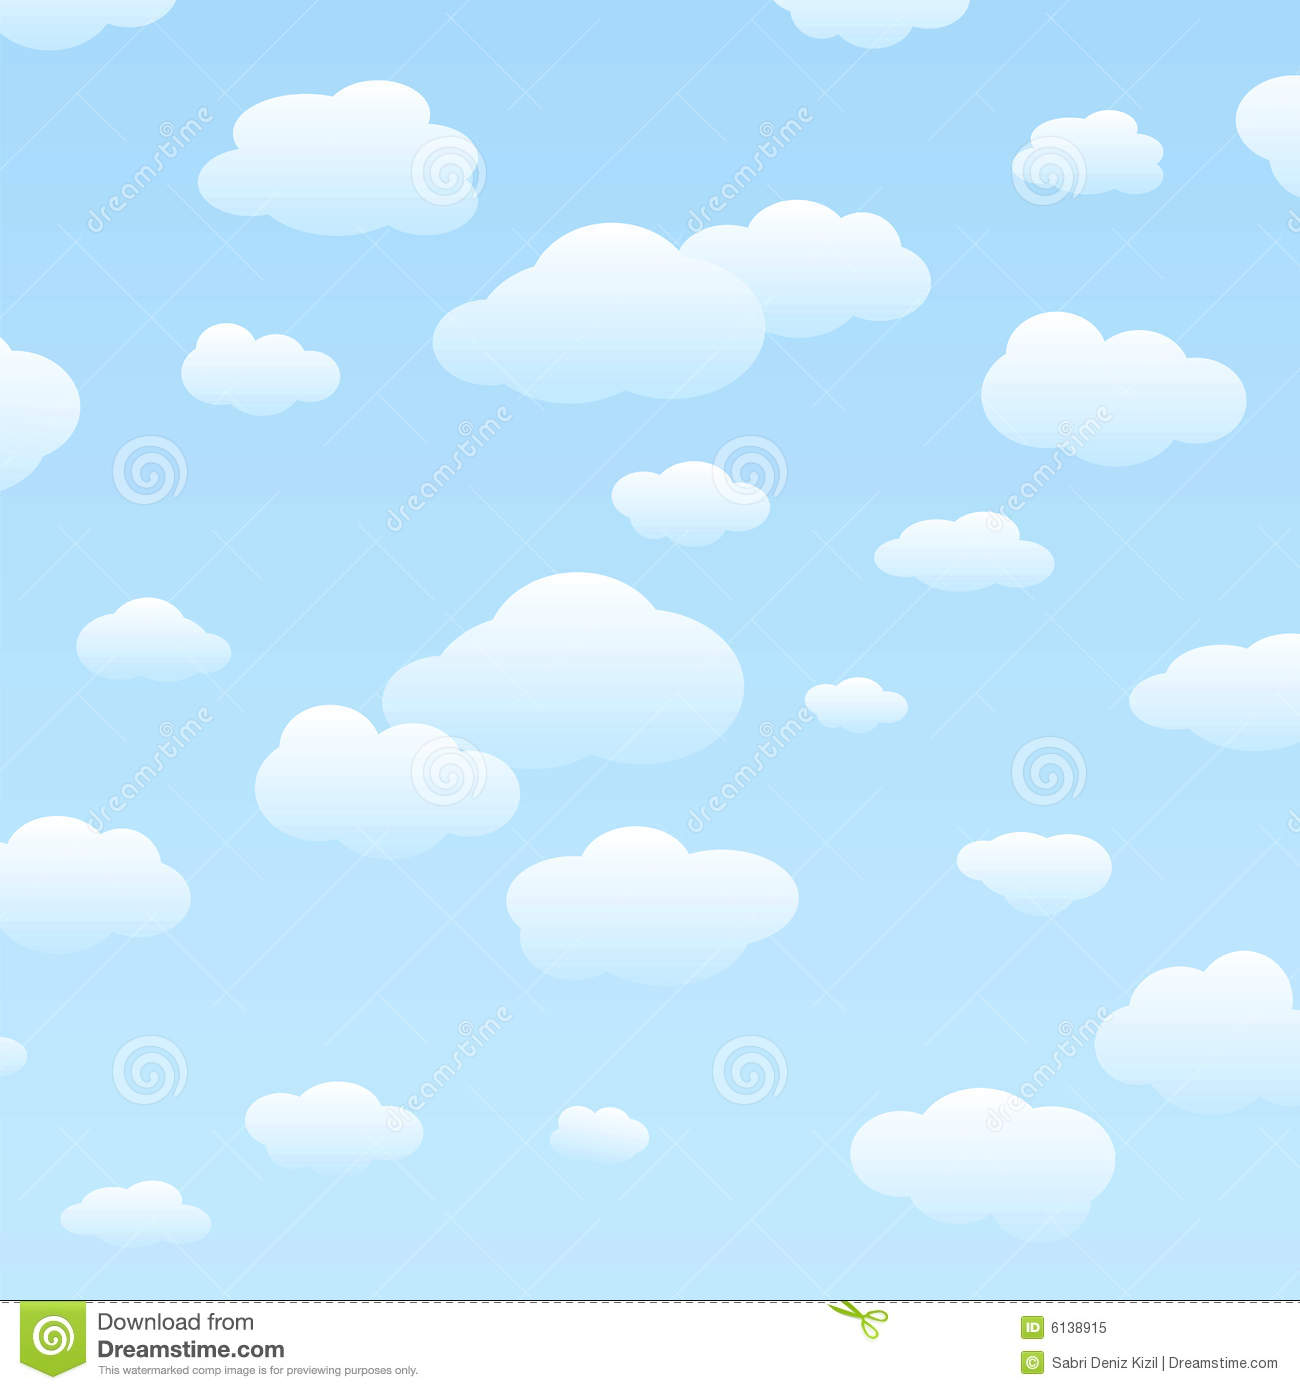 Sky clipart 71Kb sky 70 sky art